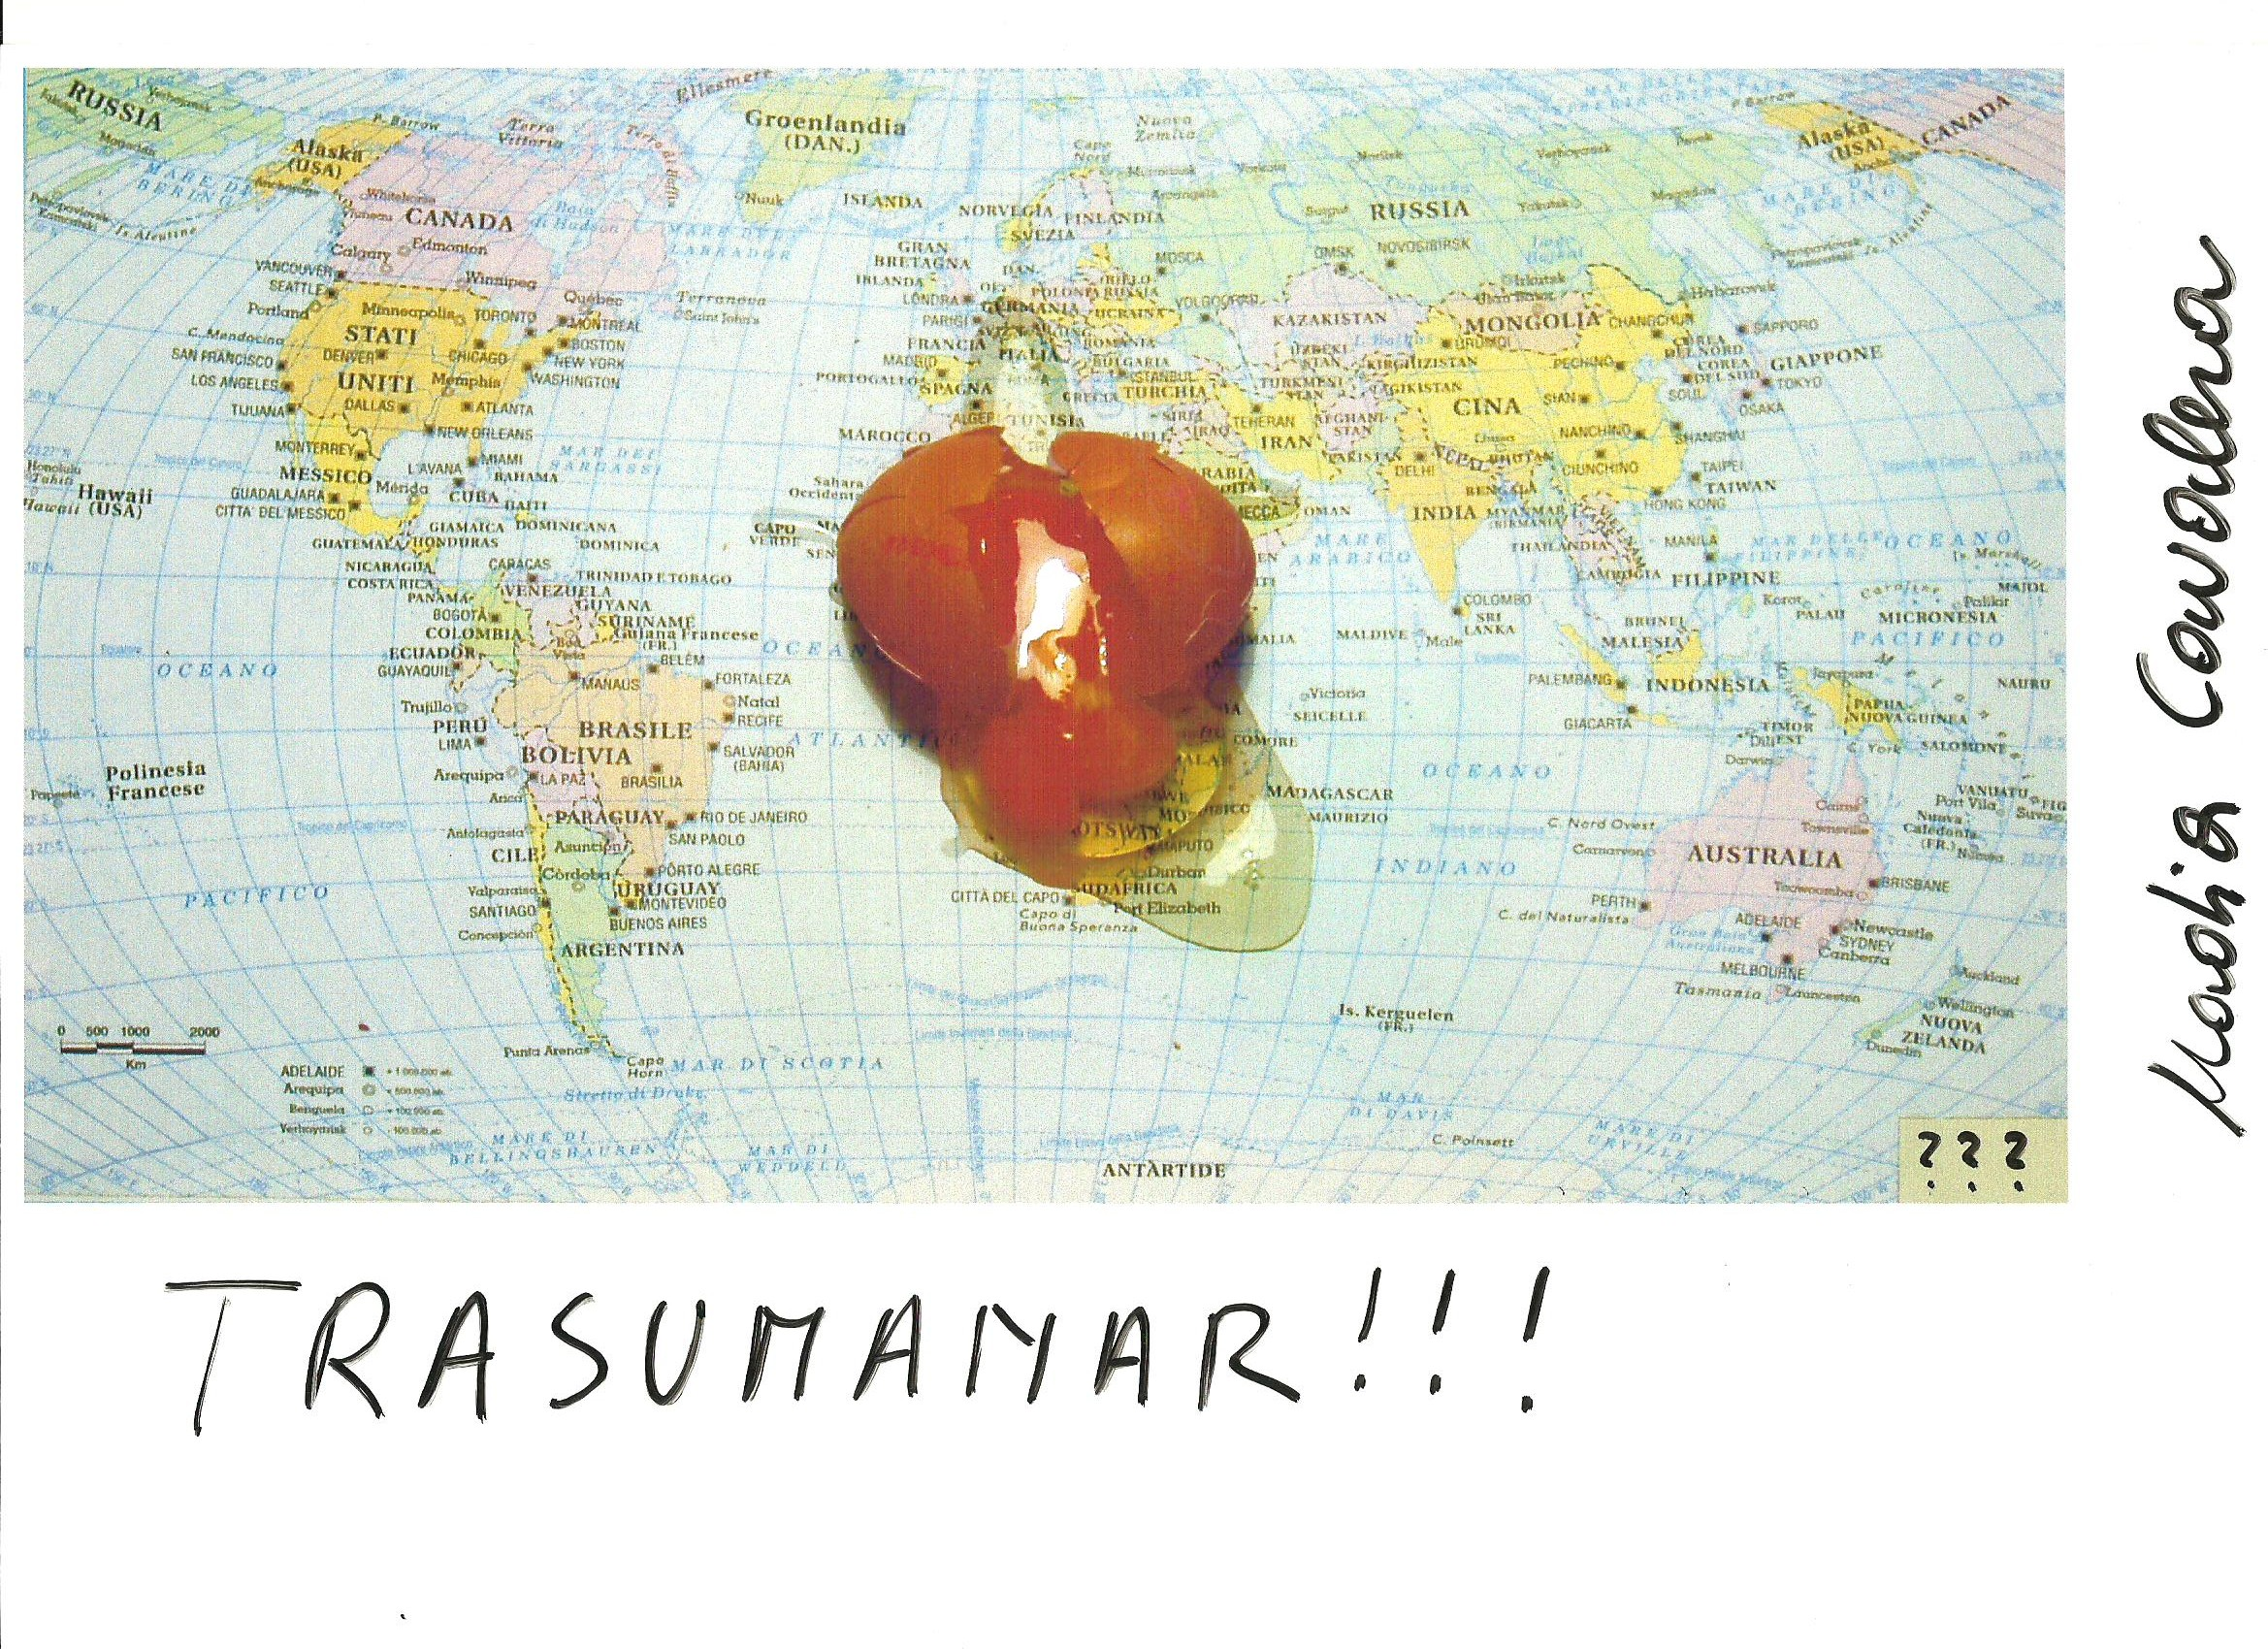 Trasumanar, di Nadia Cavalera per P.P.Pasolini